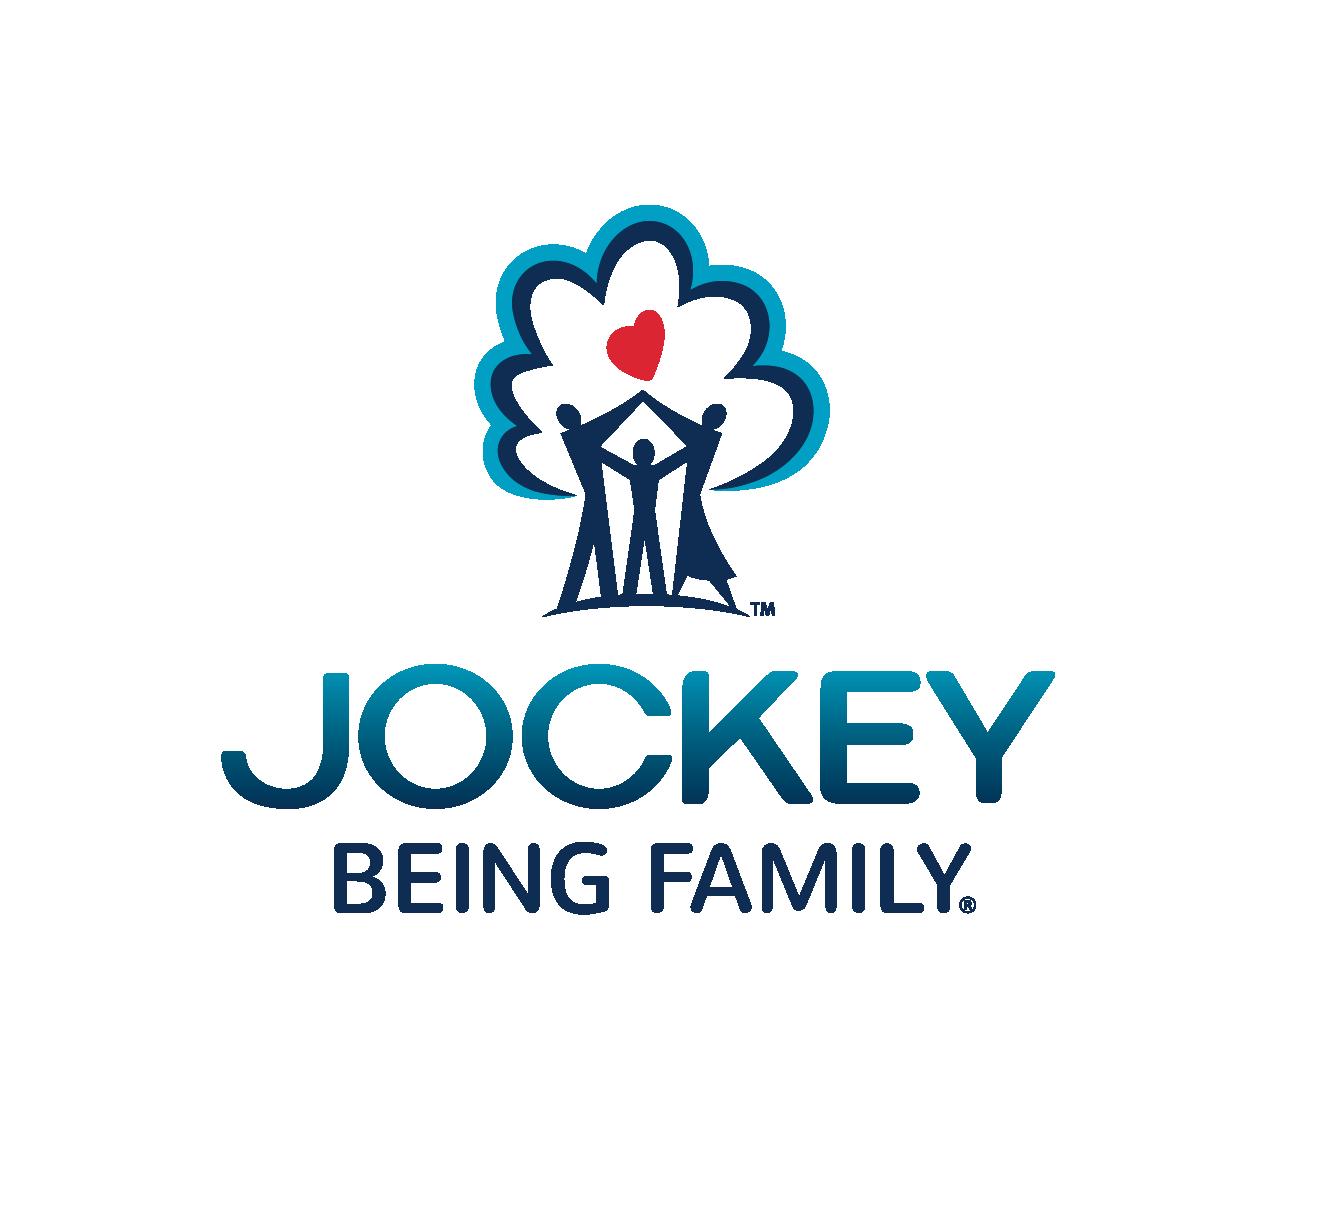 Jockey Being Family